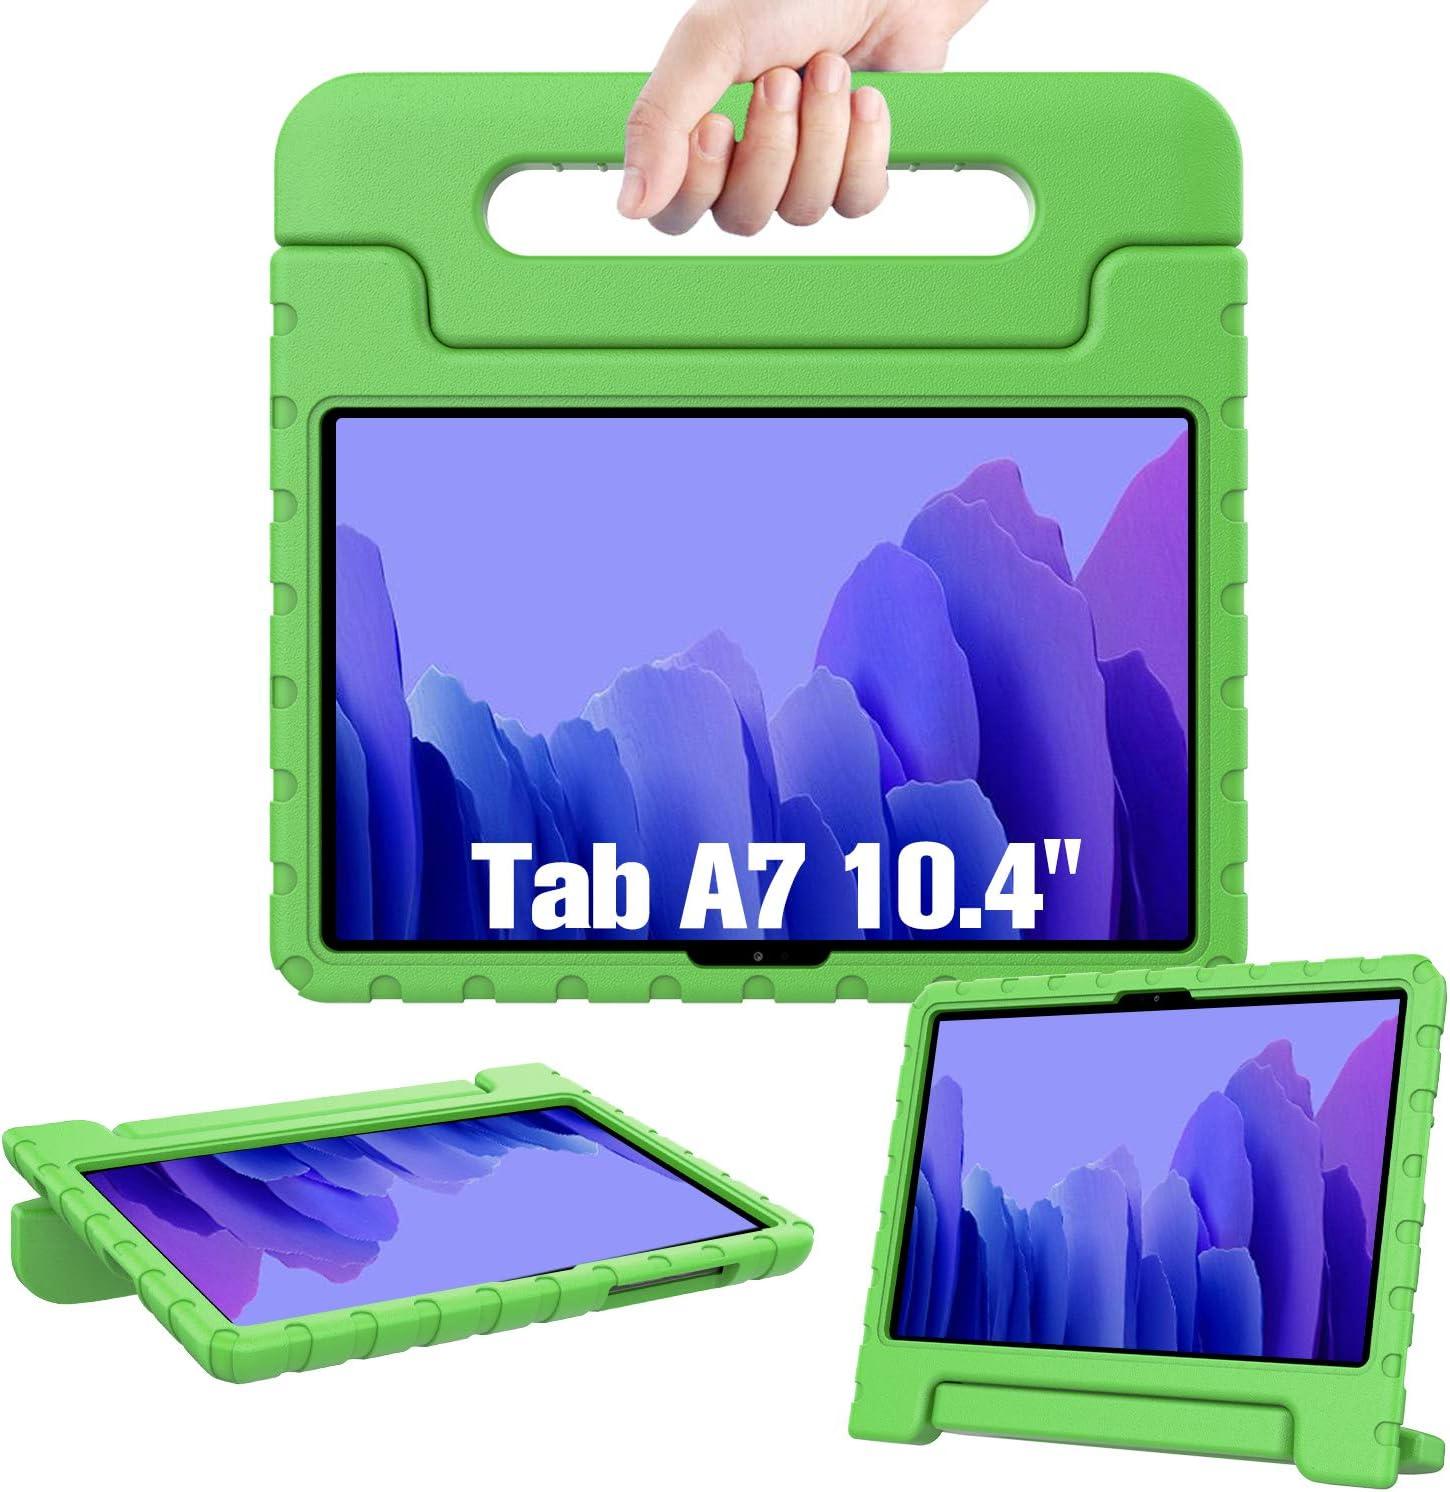 funda infantil para Samsung Galaxy Tab A7 10.4 SM-T500 verde